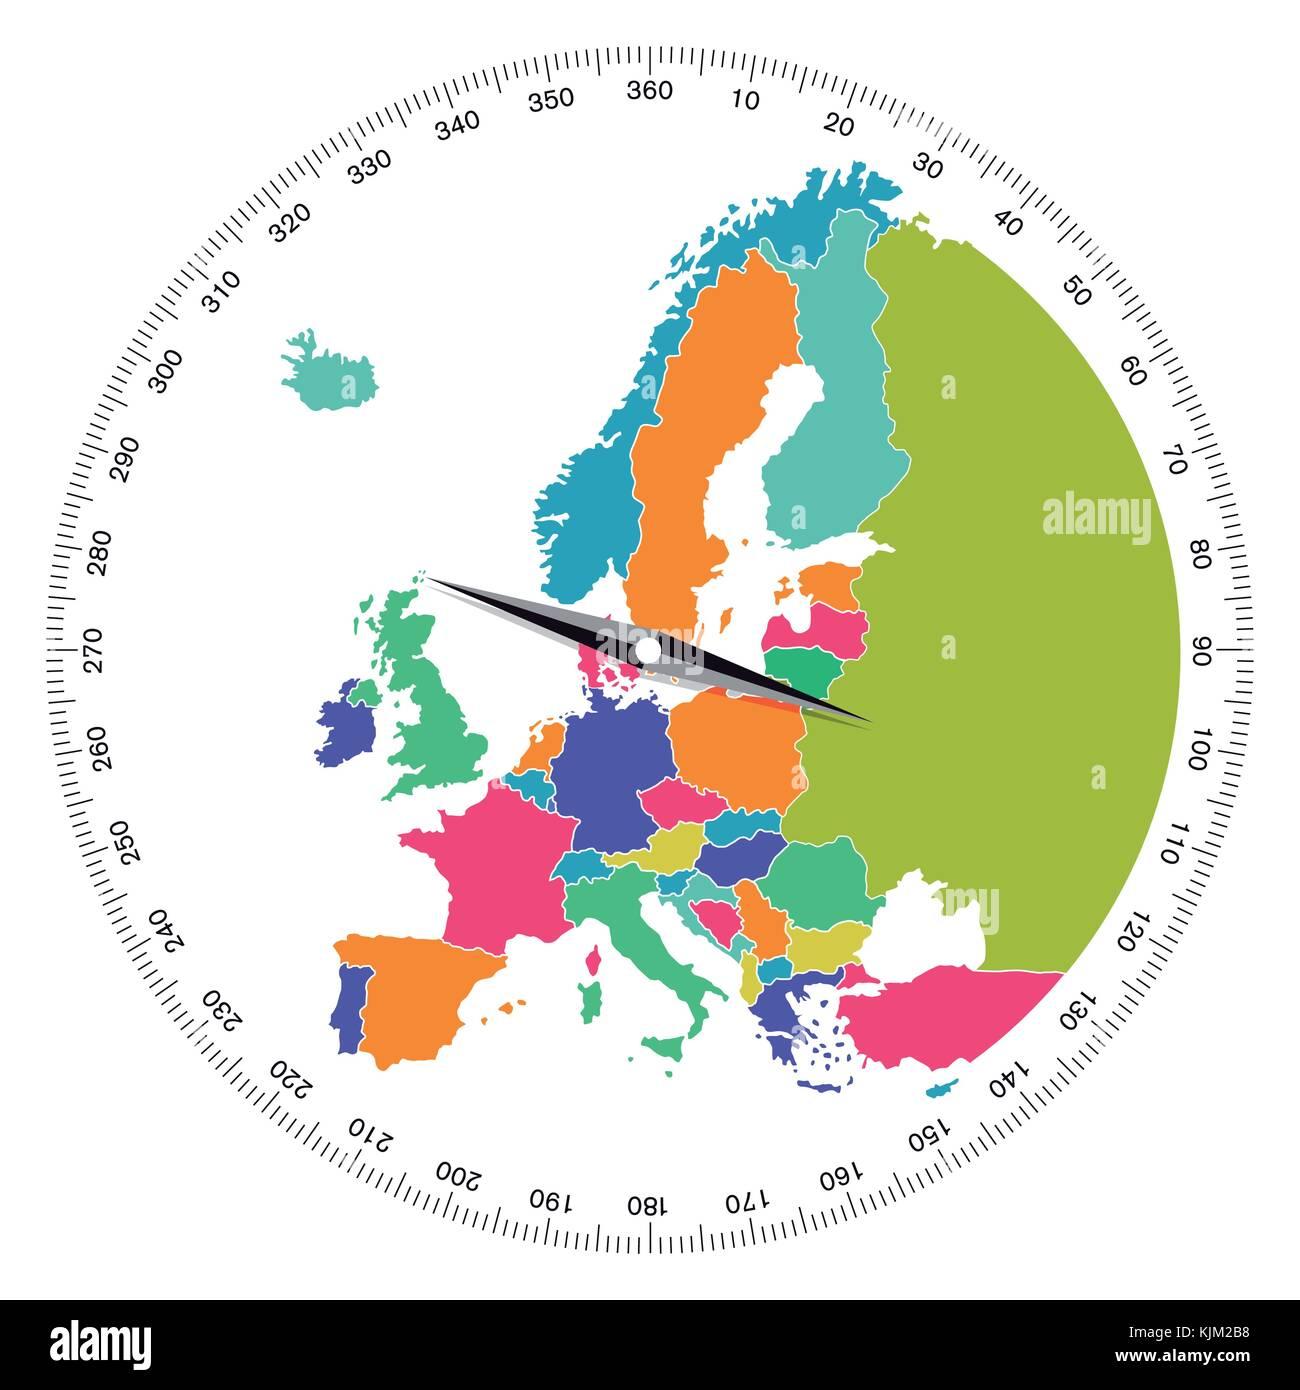 Europe, direction concept, illustration - Stock Image